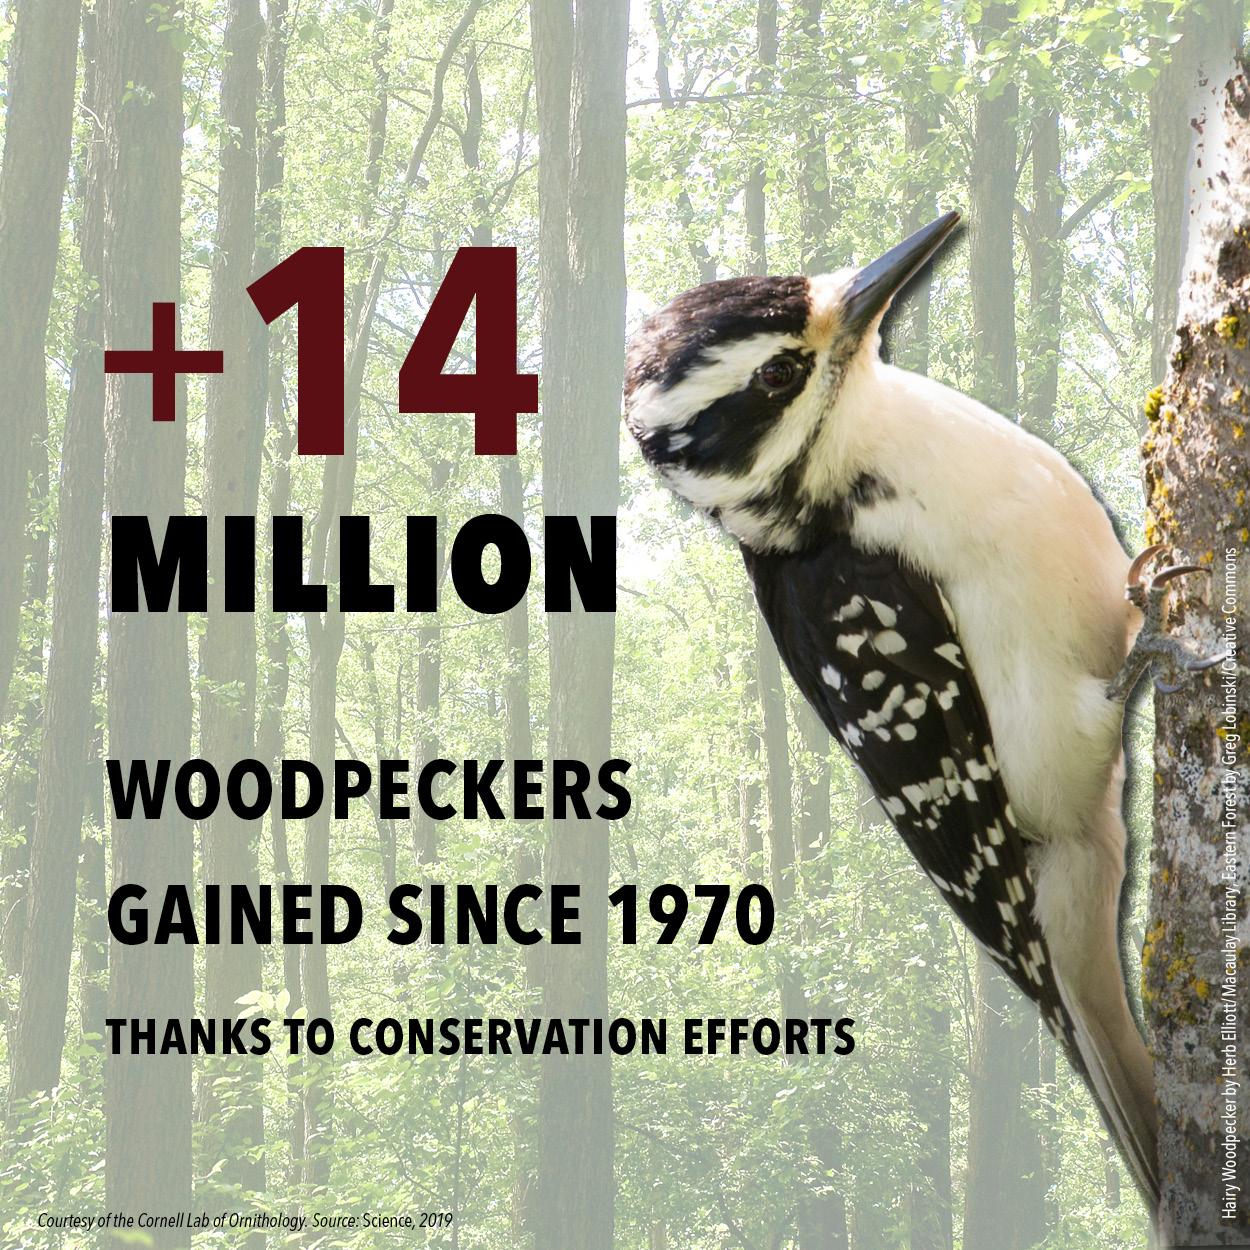 BirdDeclines-gains-woodpeckers.jpg